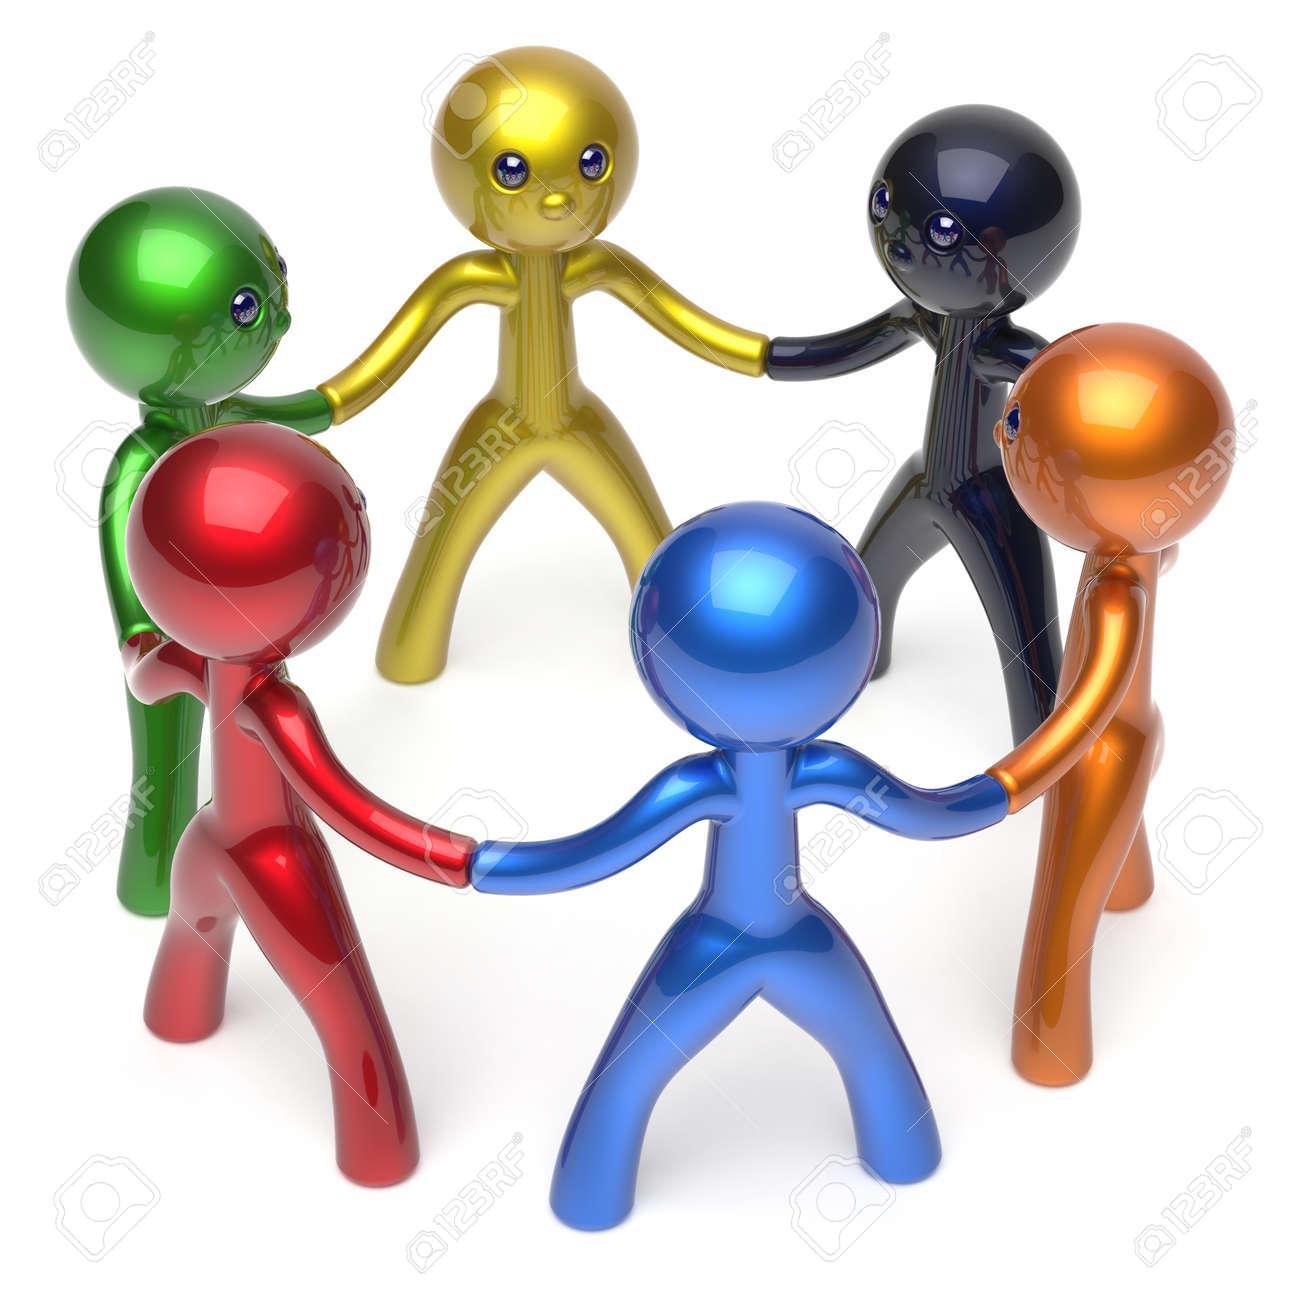 social network characters teamwork human resources circle people social network characters teamwork human resources circle people individuality friendship team six different cartoon friends unity